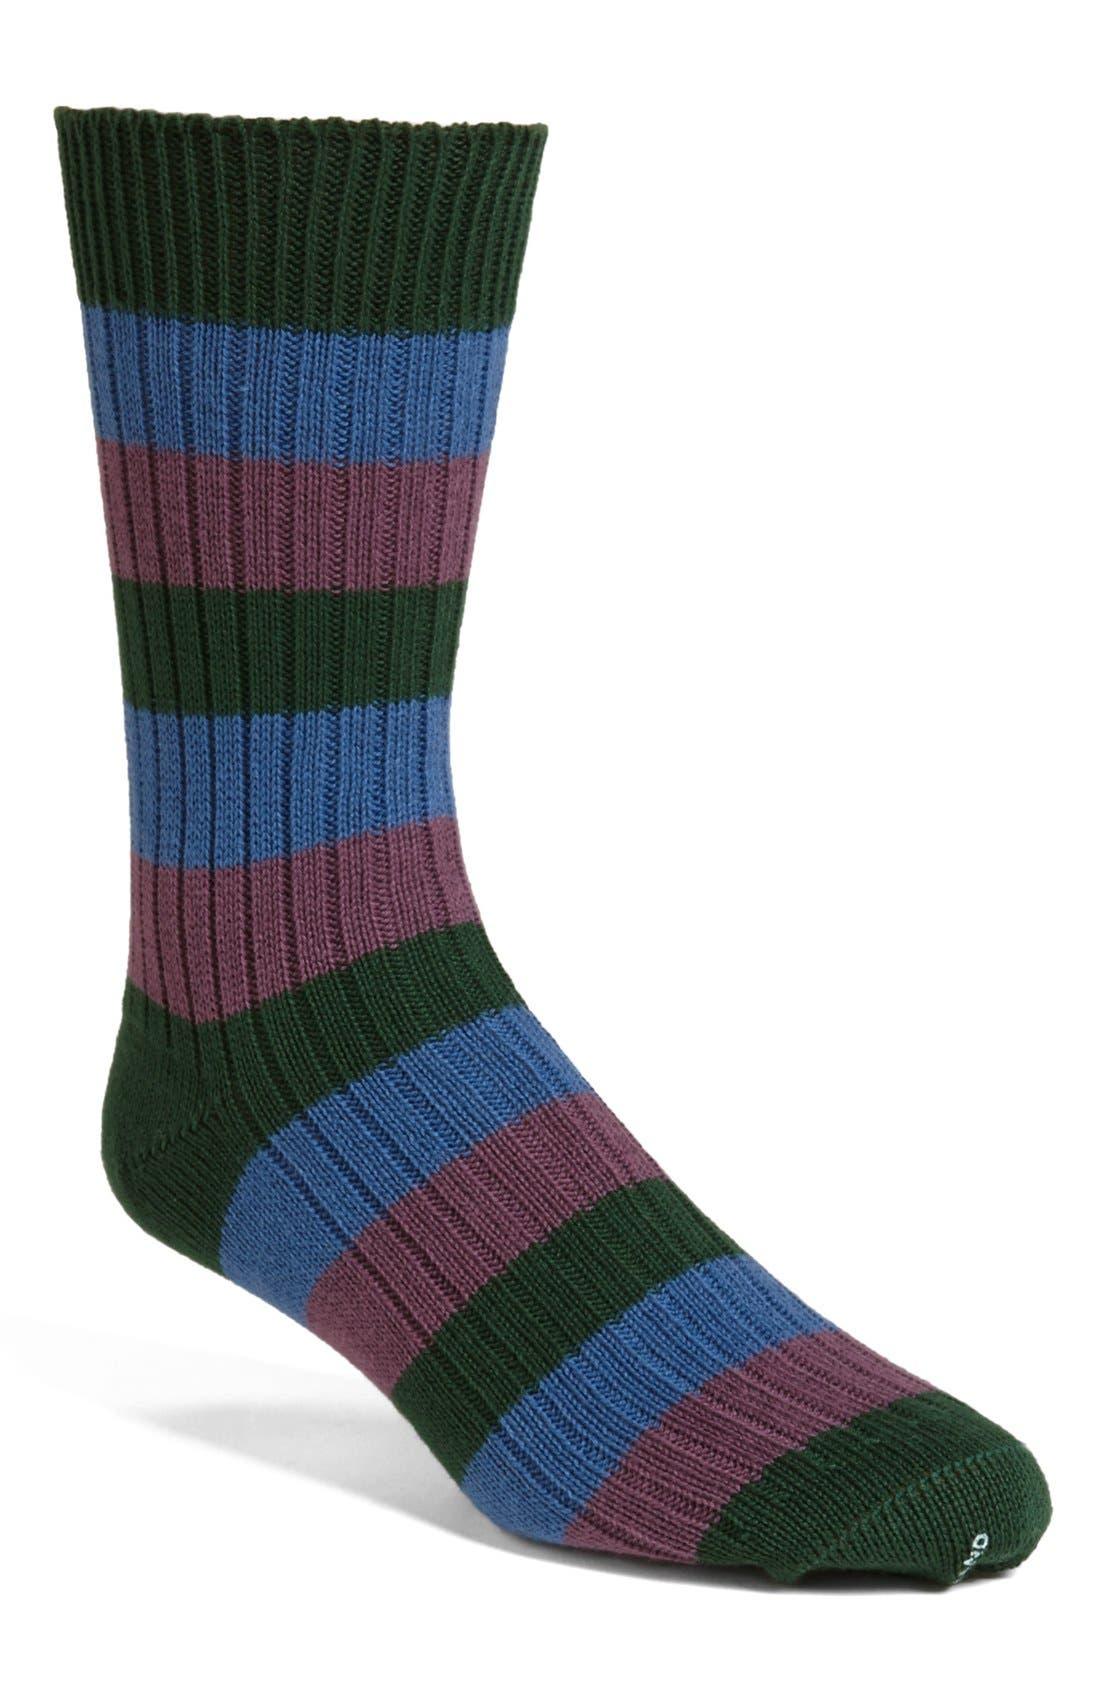 Main Image - Smart Turnout London 'Royal Regiment of Scotland' Socks